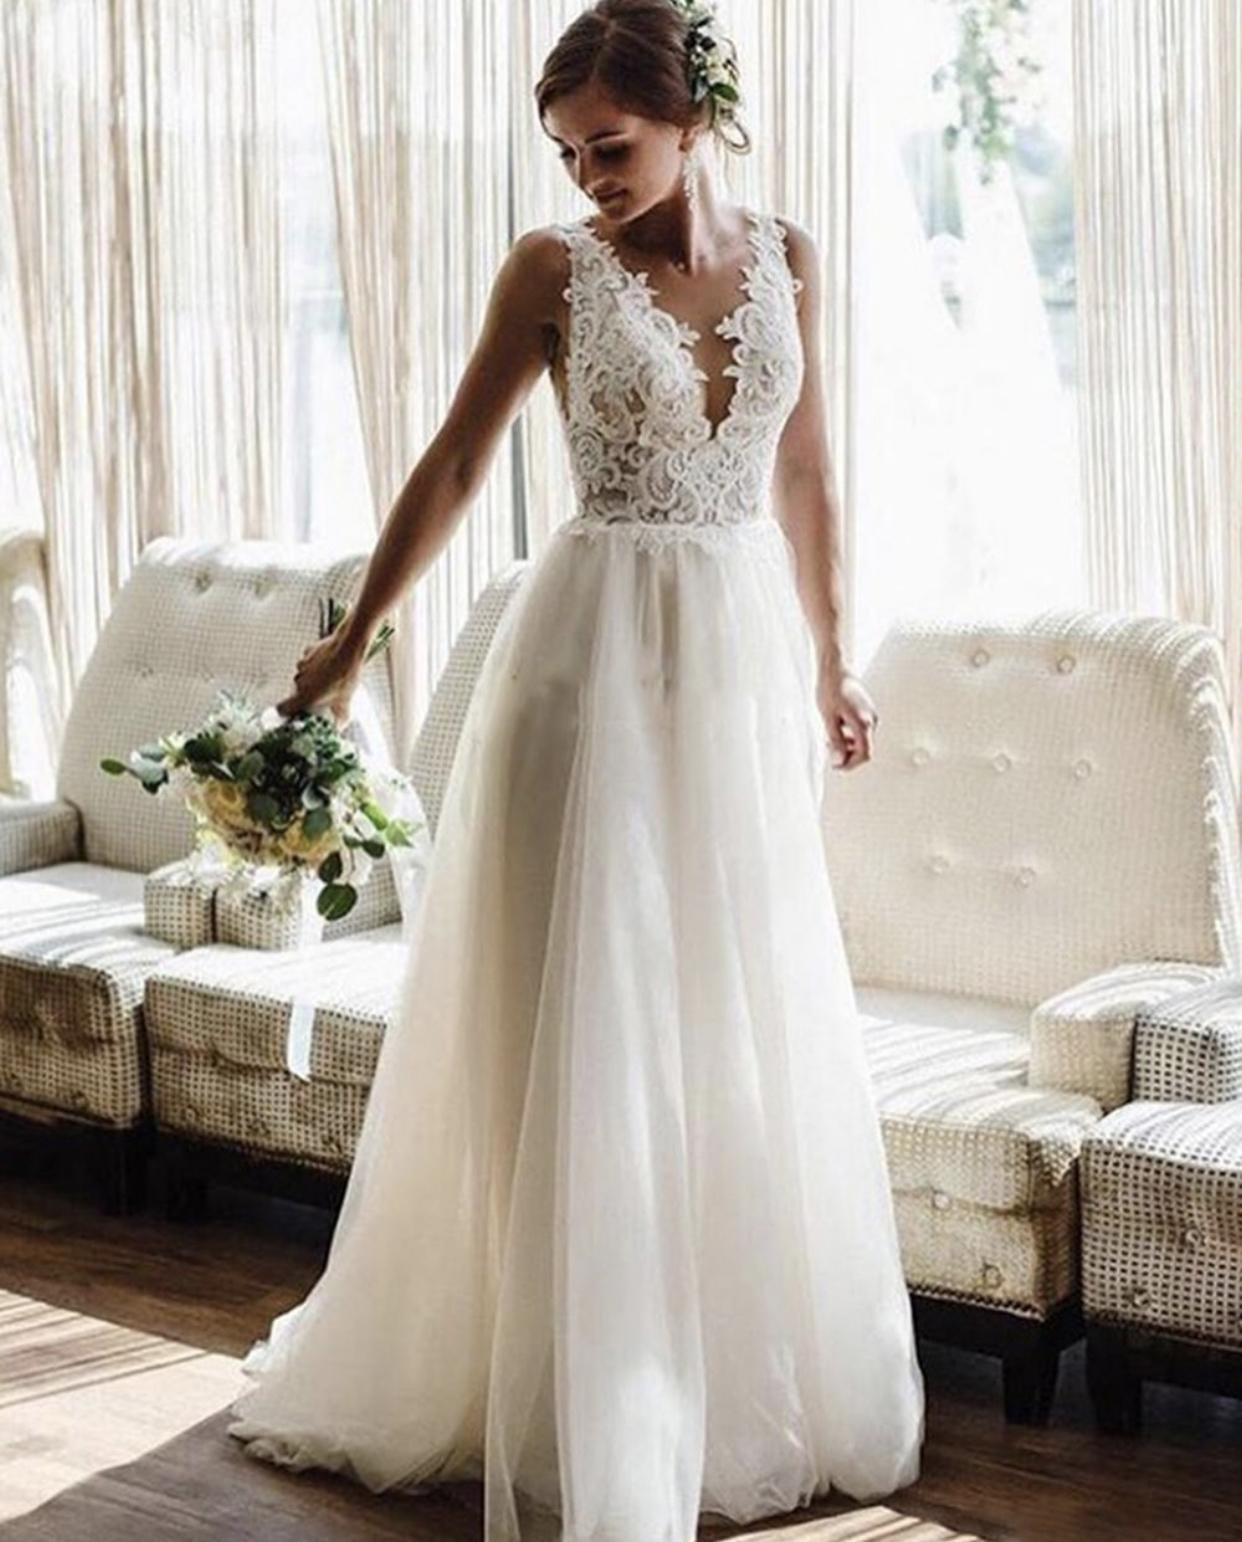 2022 Beach Wedding Dresses Bridal Gowns Lace Applique Bohemian Sheer V-Neck Backless Floor Length Custom Made Chic Tulle Plus Size Vestido De Noiva